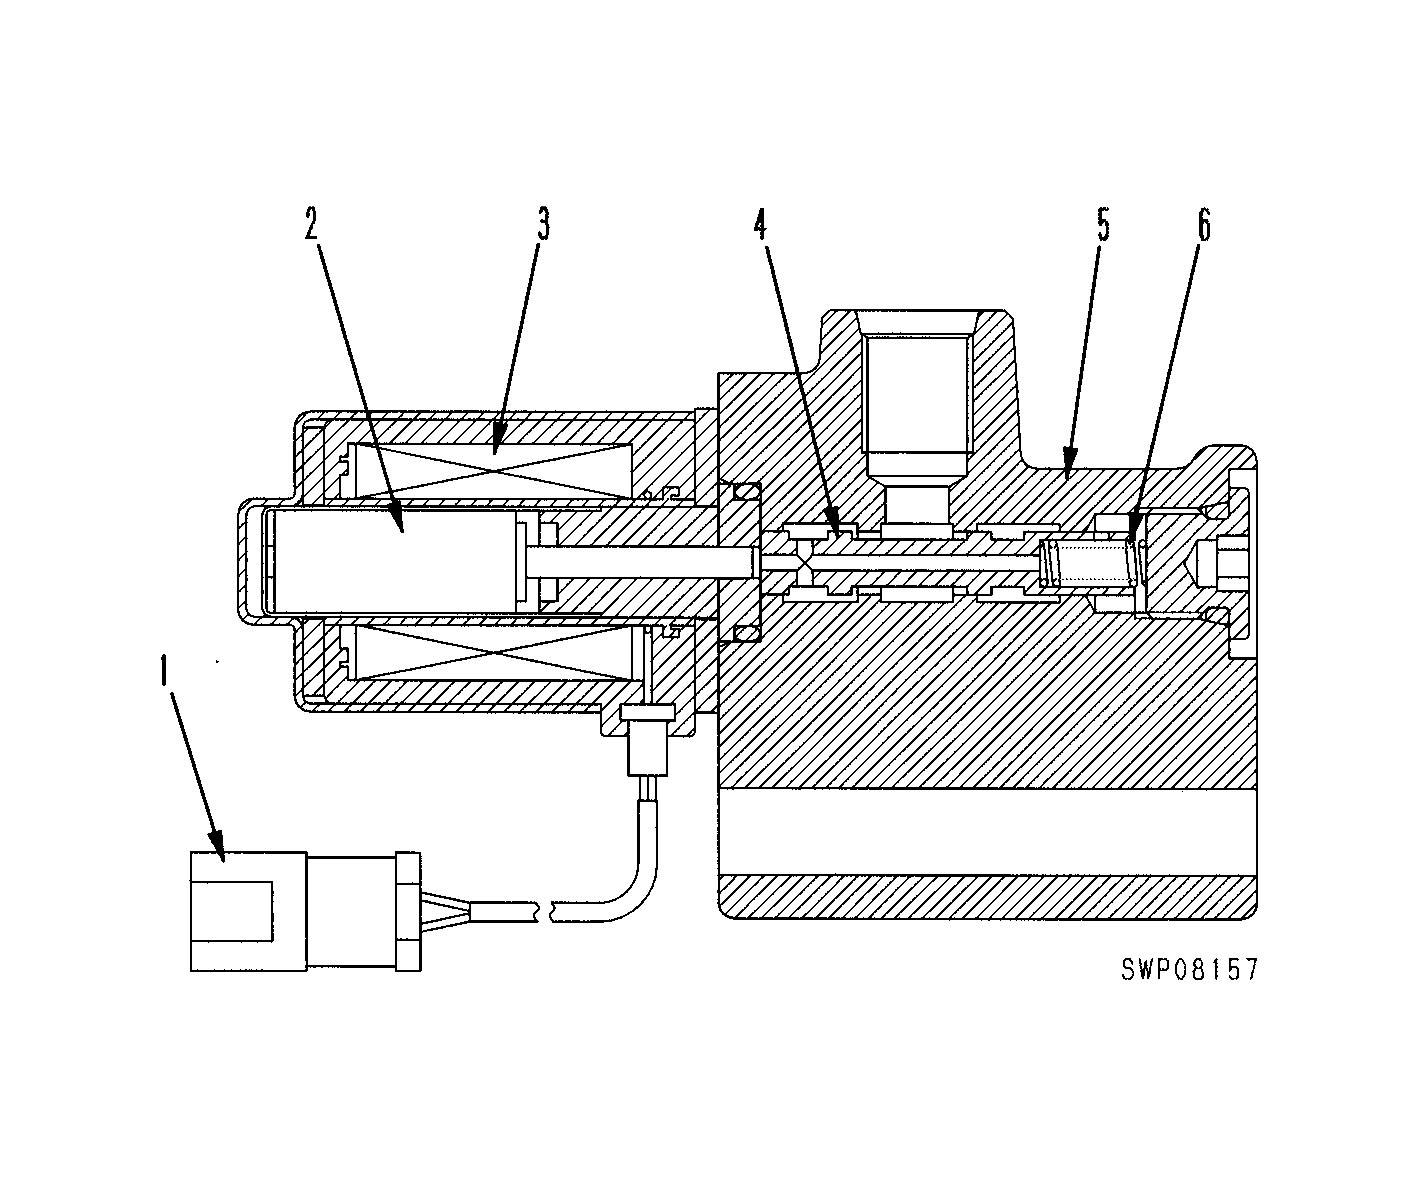 Проверка электромагнитного клапана карбюратора солекс 2108, 21081, 21083 | twokarburators.ru